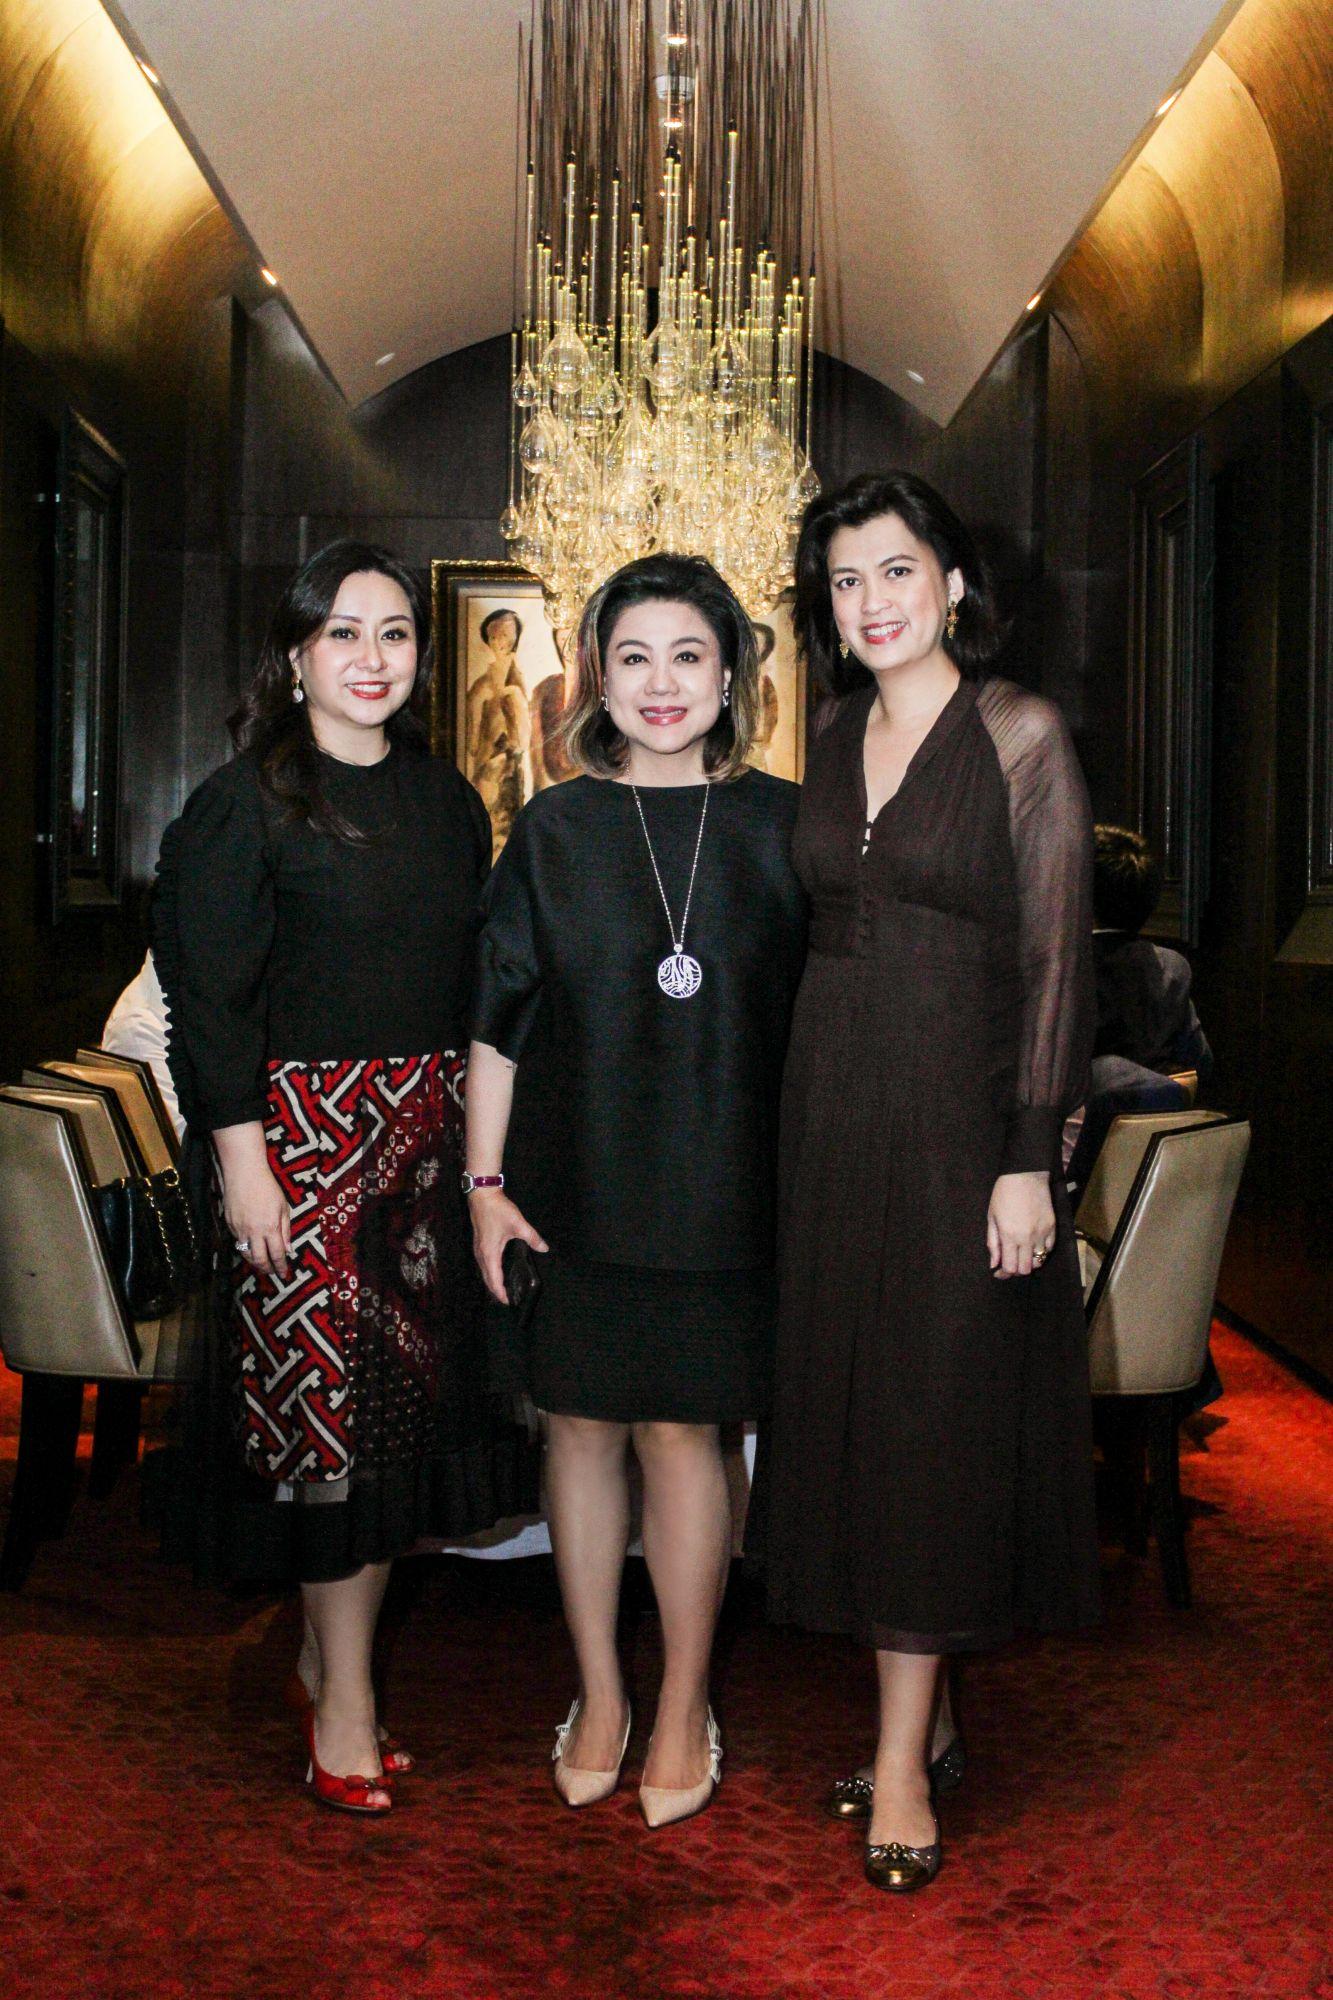 Wulan Tilaar Widarto, vice chairwoman of Martha Tilaar Group; Millie Stephanie Lukito, CEO of Mobiliari Group; and celebrity chef Arimbi Nimpuno